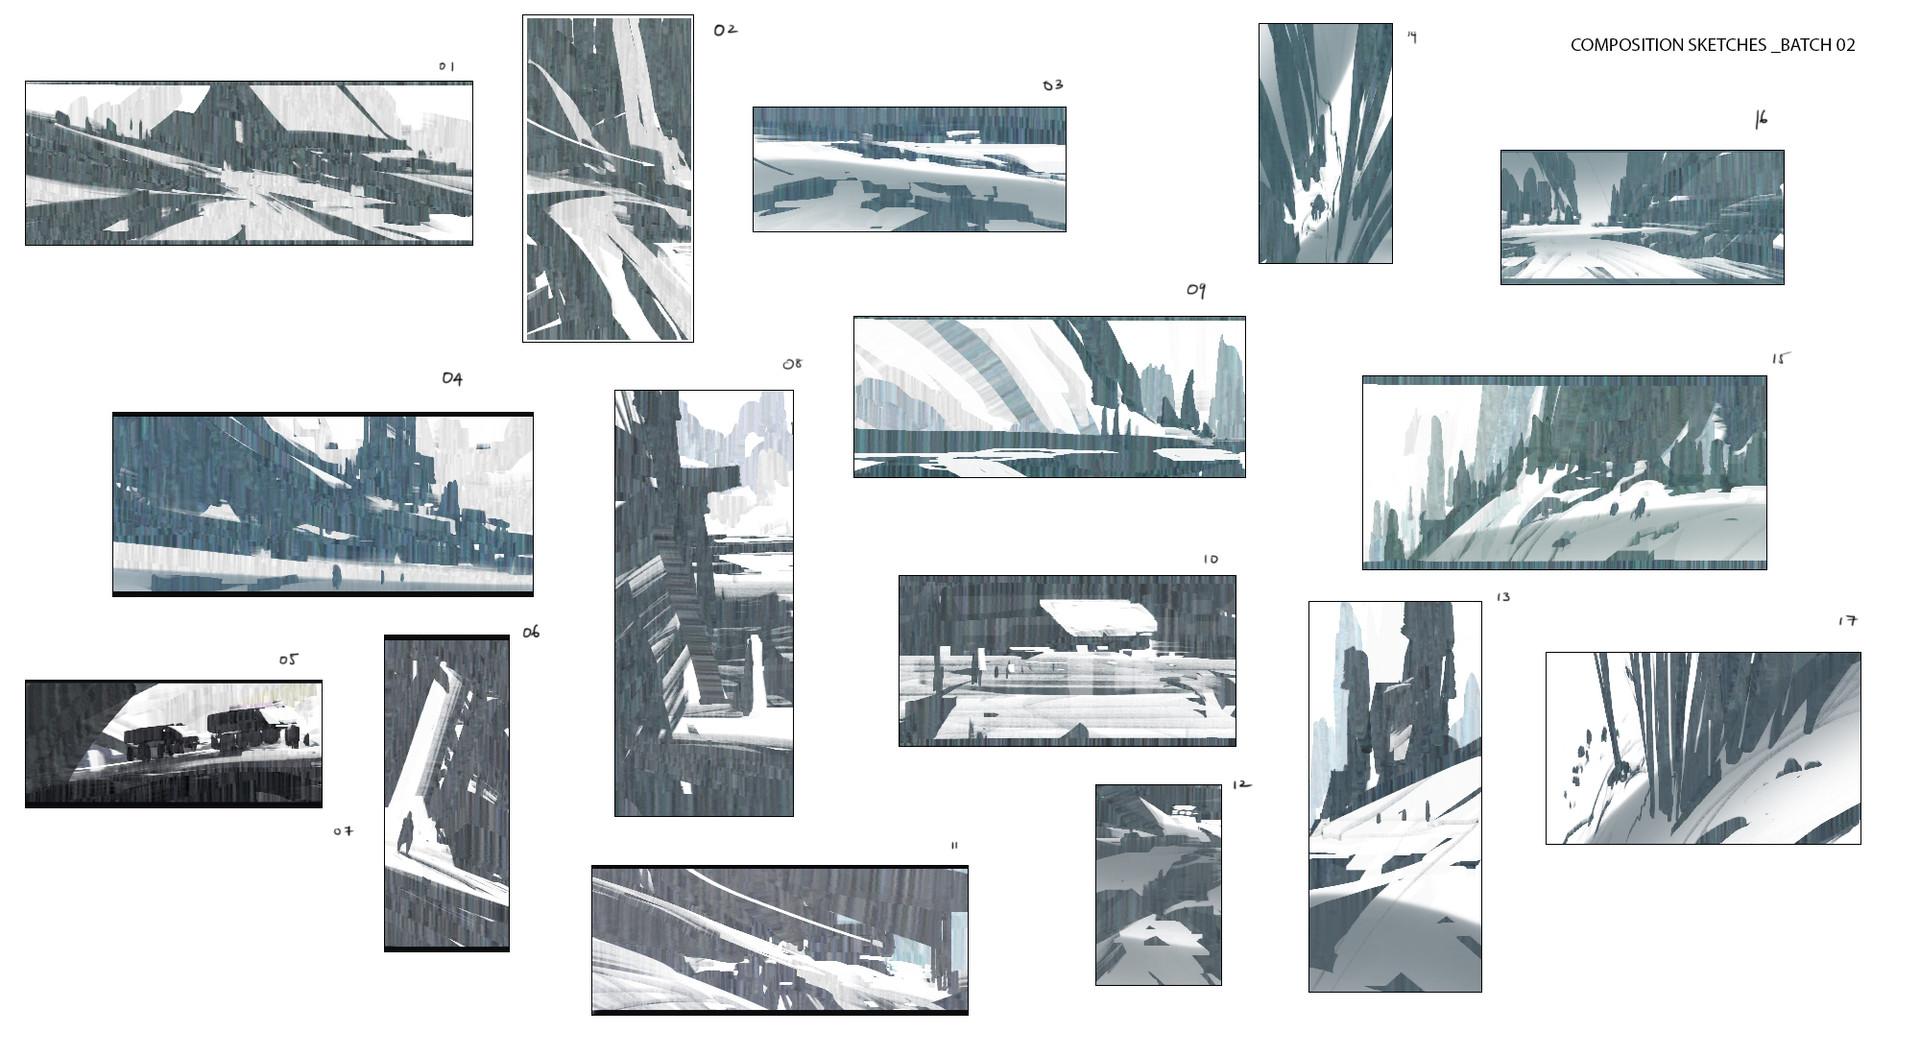 Sathish kumar compositionsketch batch01